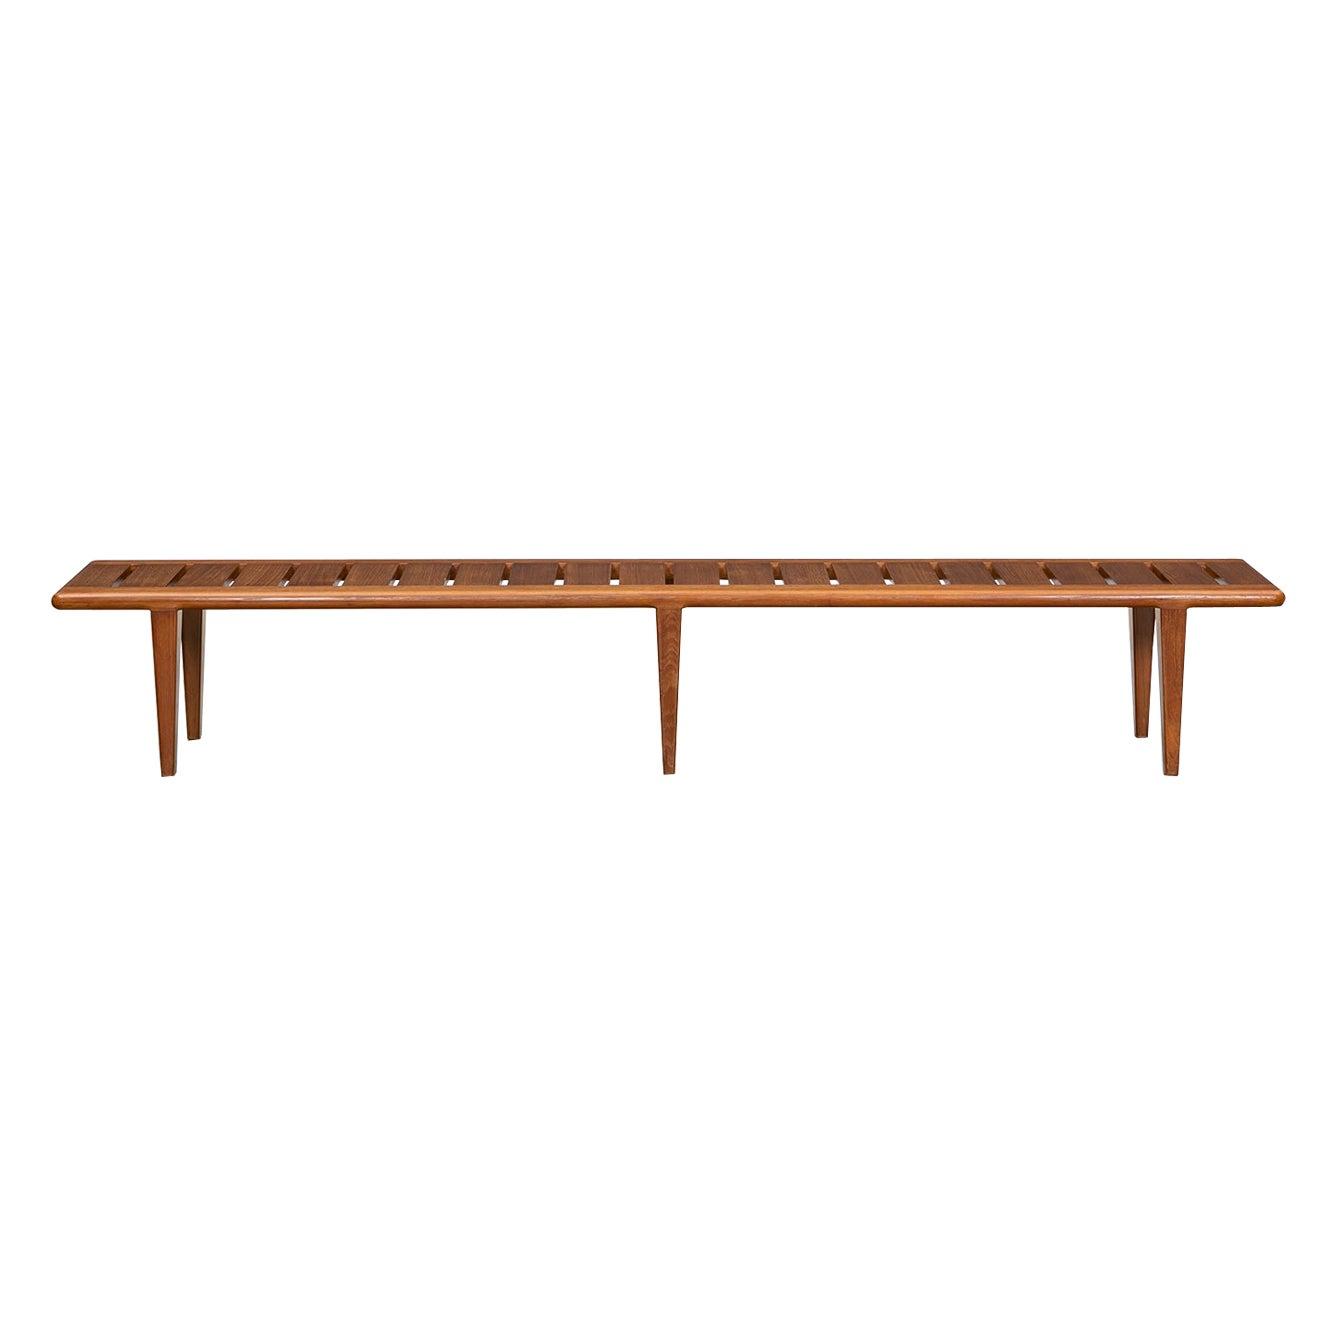 1950s Brown Teak Bench by Hans Wegner